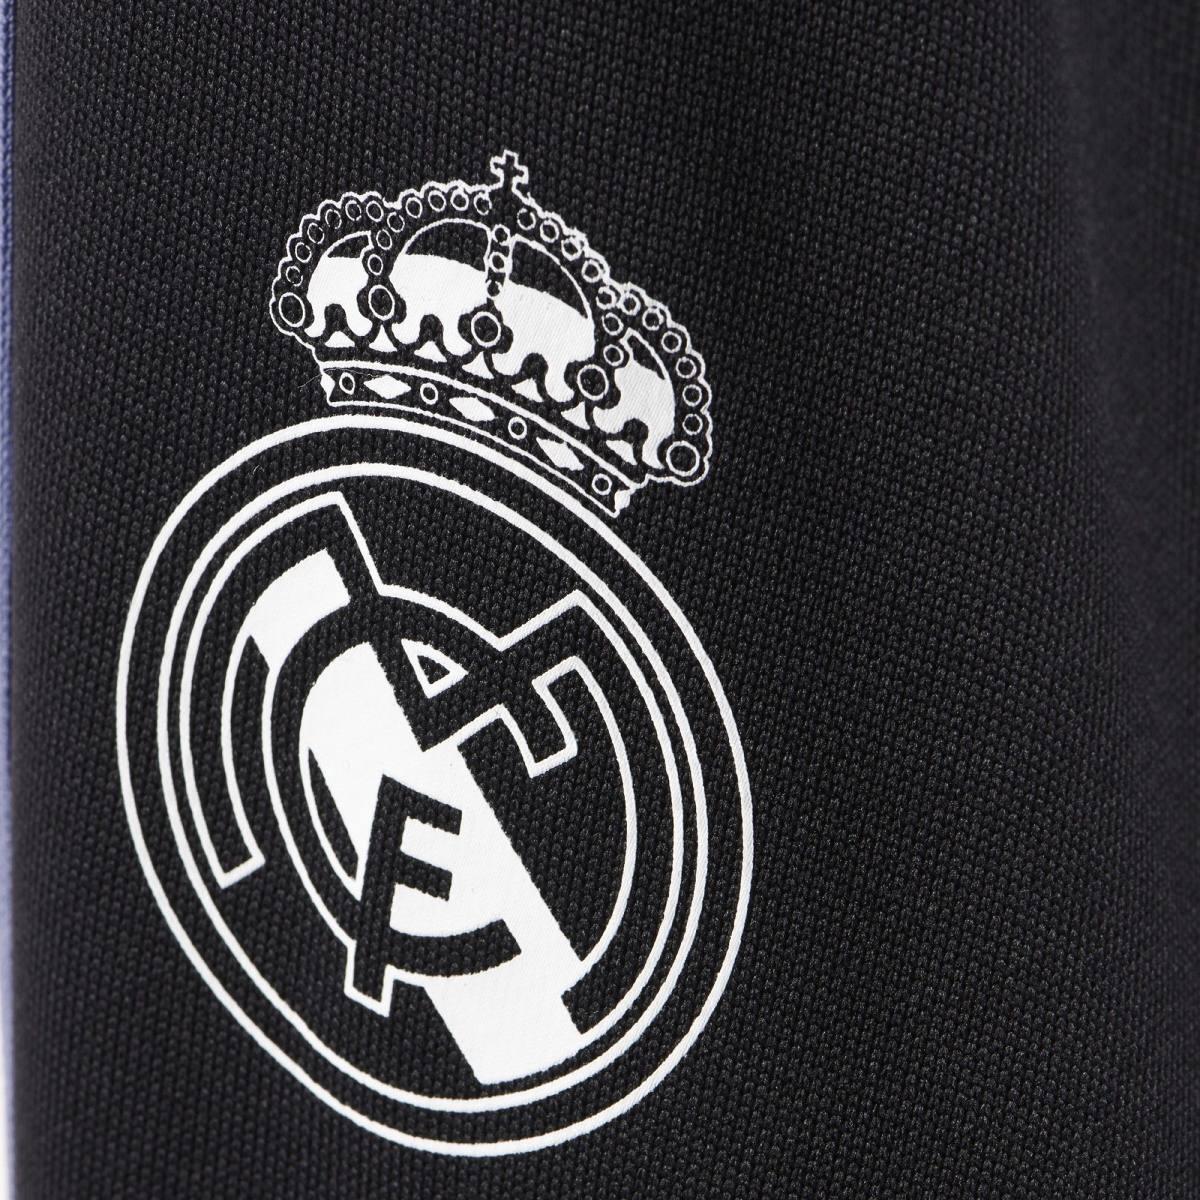 Pants Entrenamiento Portero Real Madrid Cristiano Ronaldo ...